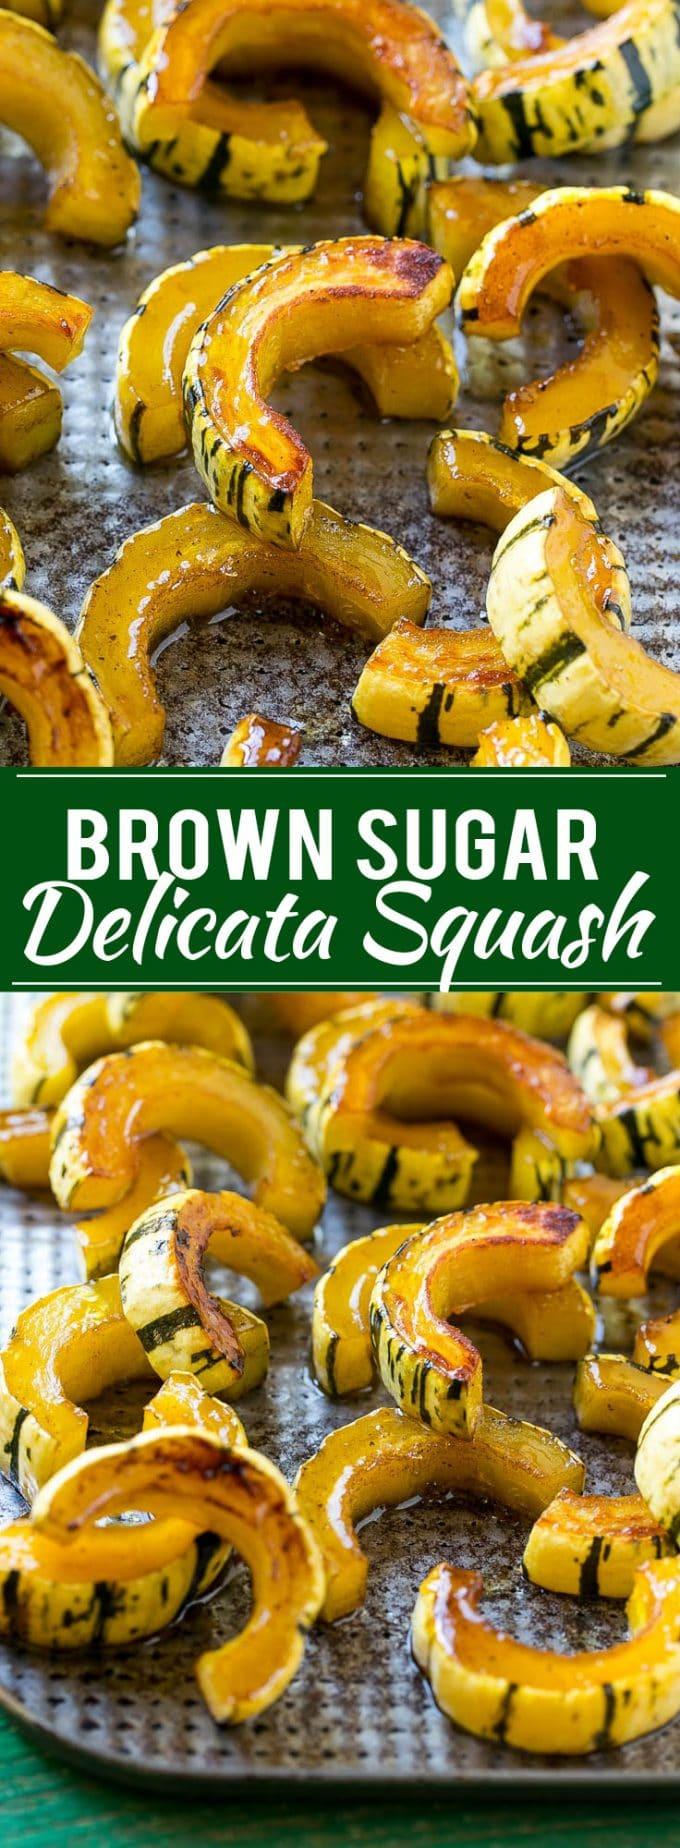 Brown Sugar Delicata Squash Recipe | Roasted Squash | Delicata Squash | Winter Squash Recipe #squash #wintersquash #brownsugar #sidedish #delicatasquash #dinner #dinneratthezoo